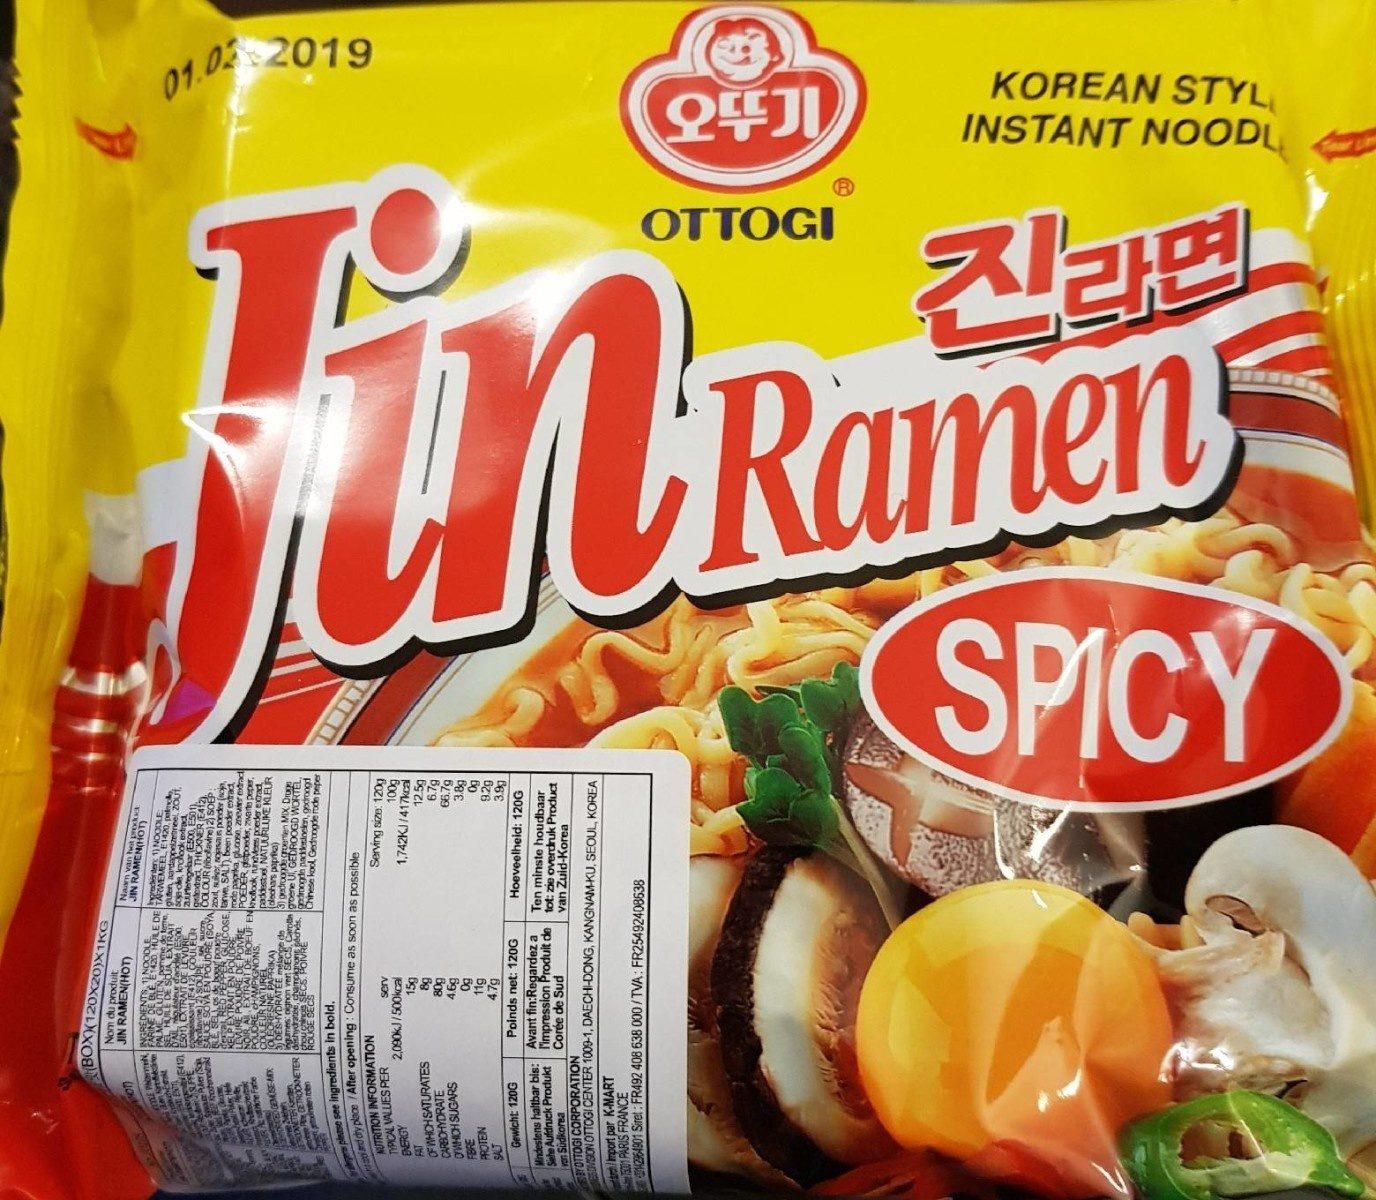 Ottogi Jin Ramen (spicy) - Product - en